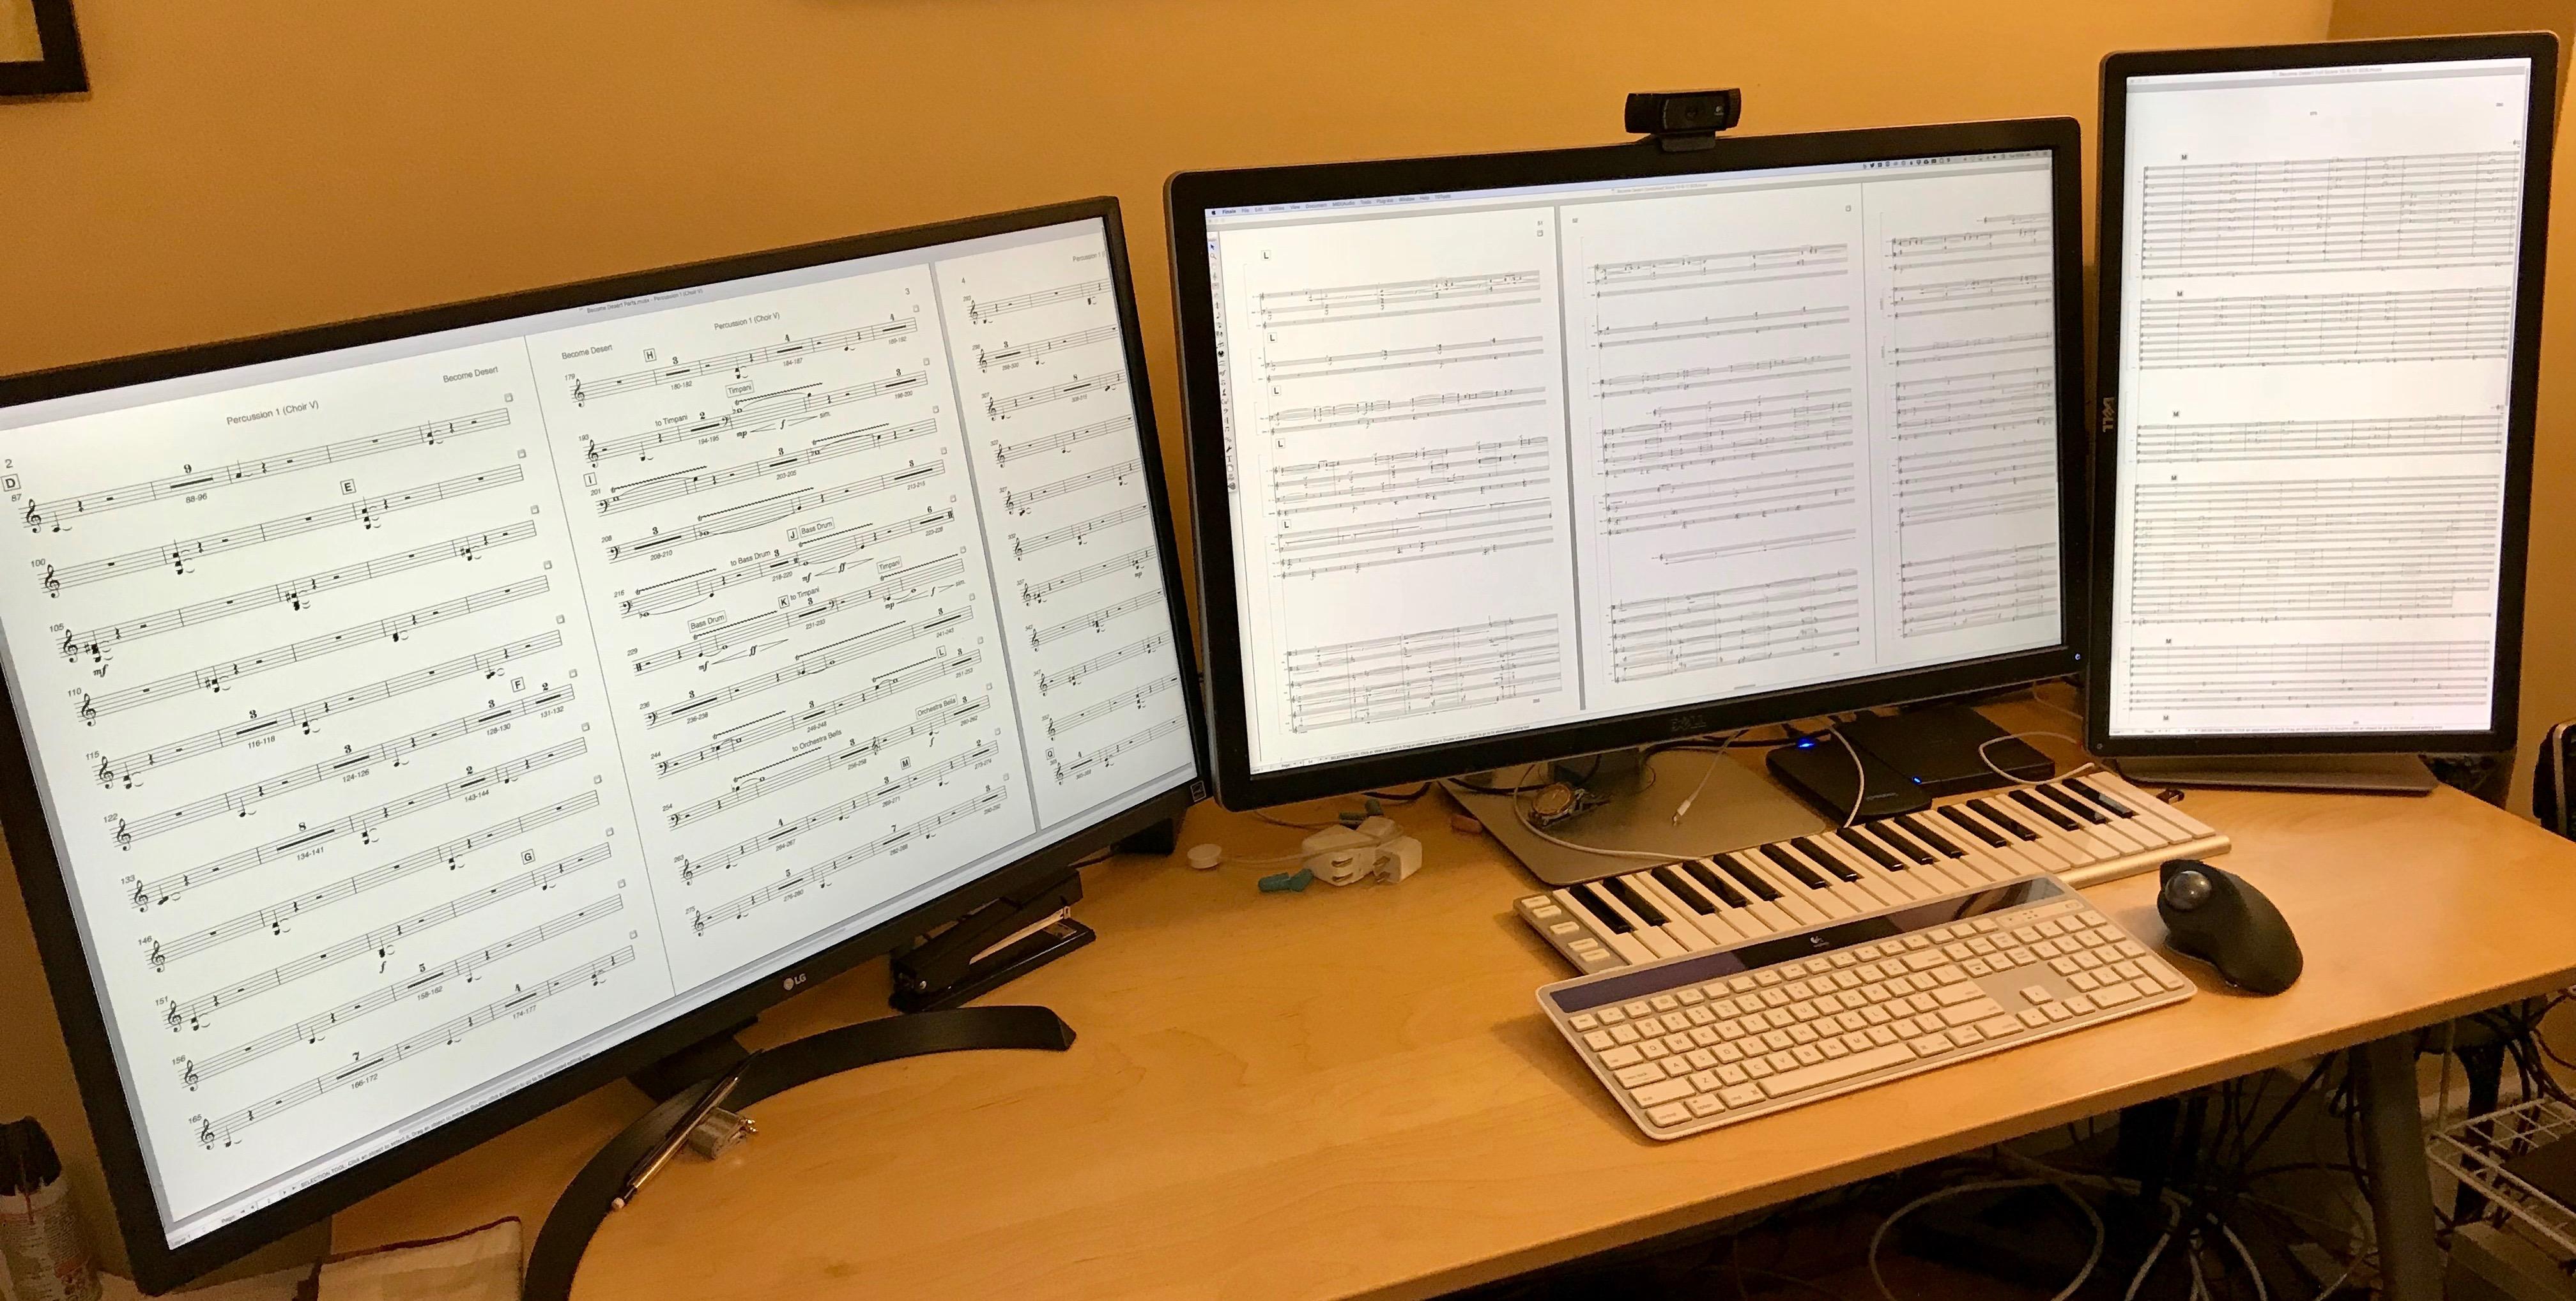 NAMM 2018: MakeMusic, SmartMusic, and Finale - Scoring Notes